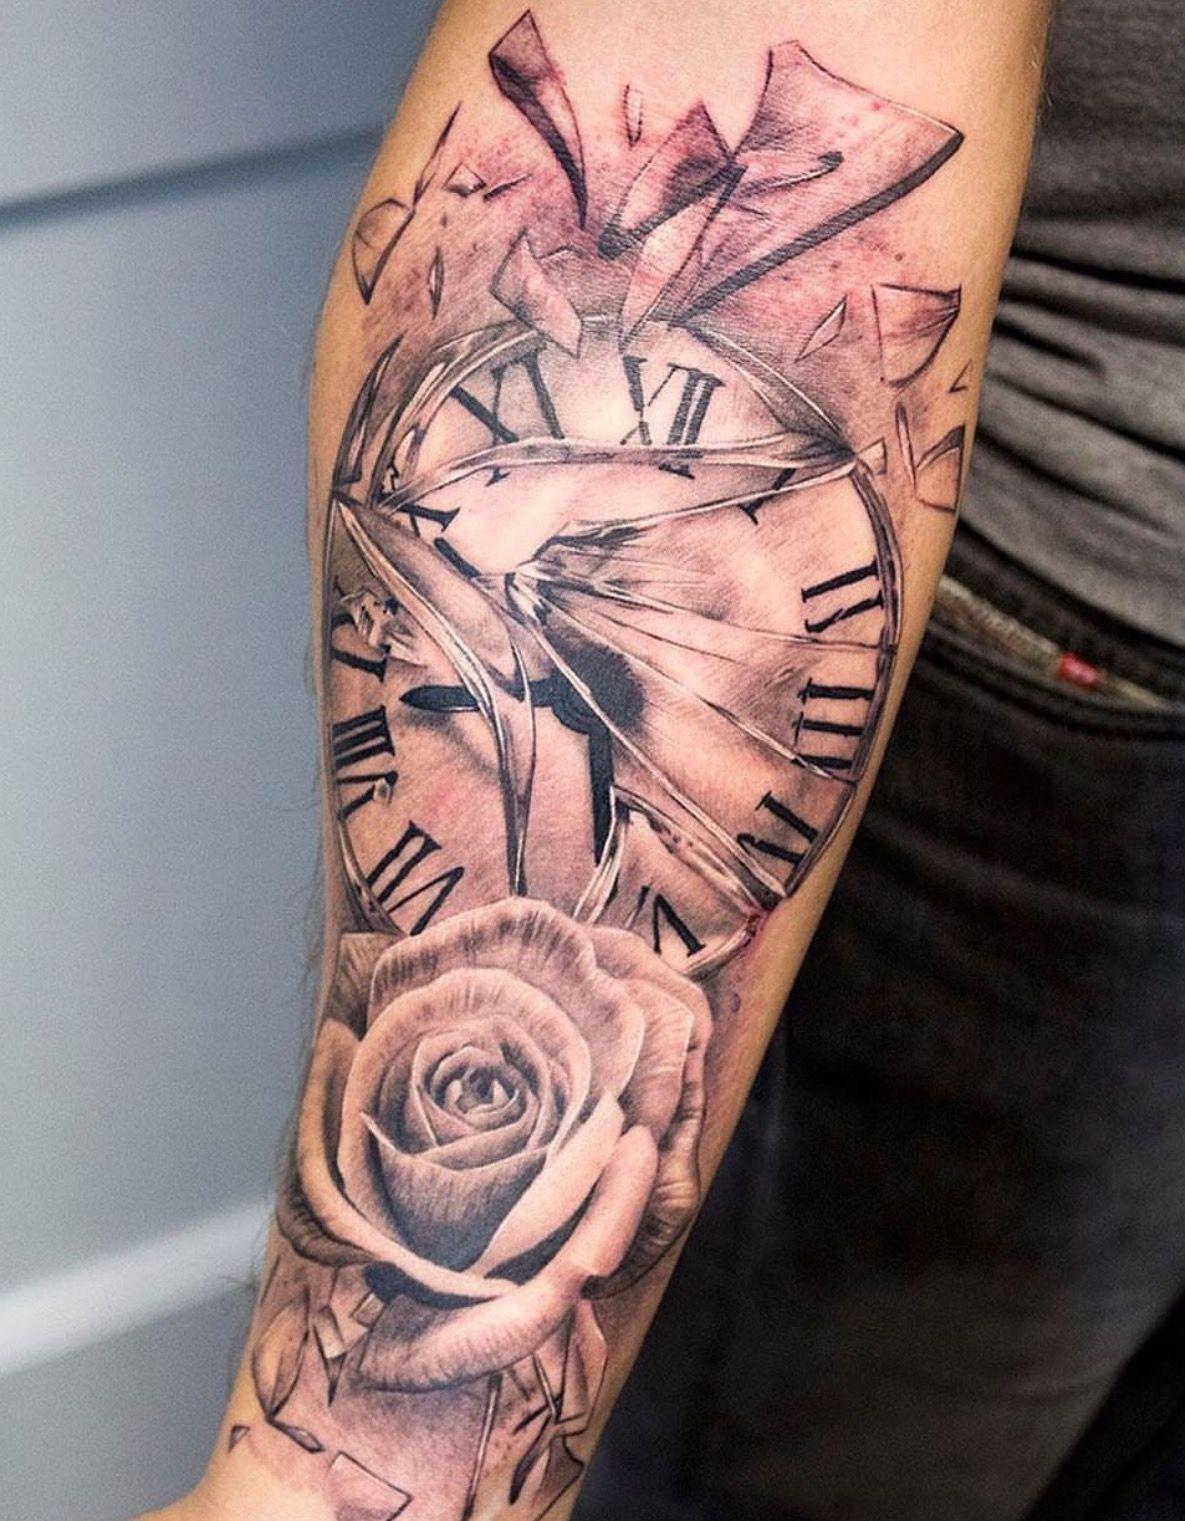 Tattoo Uhr Arm